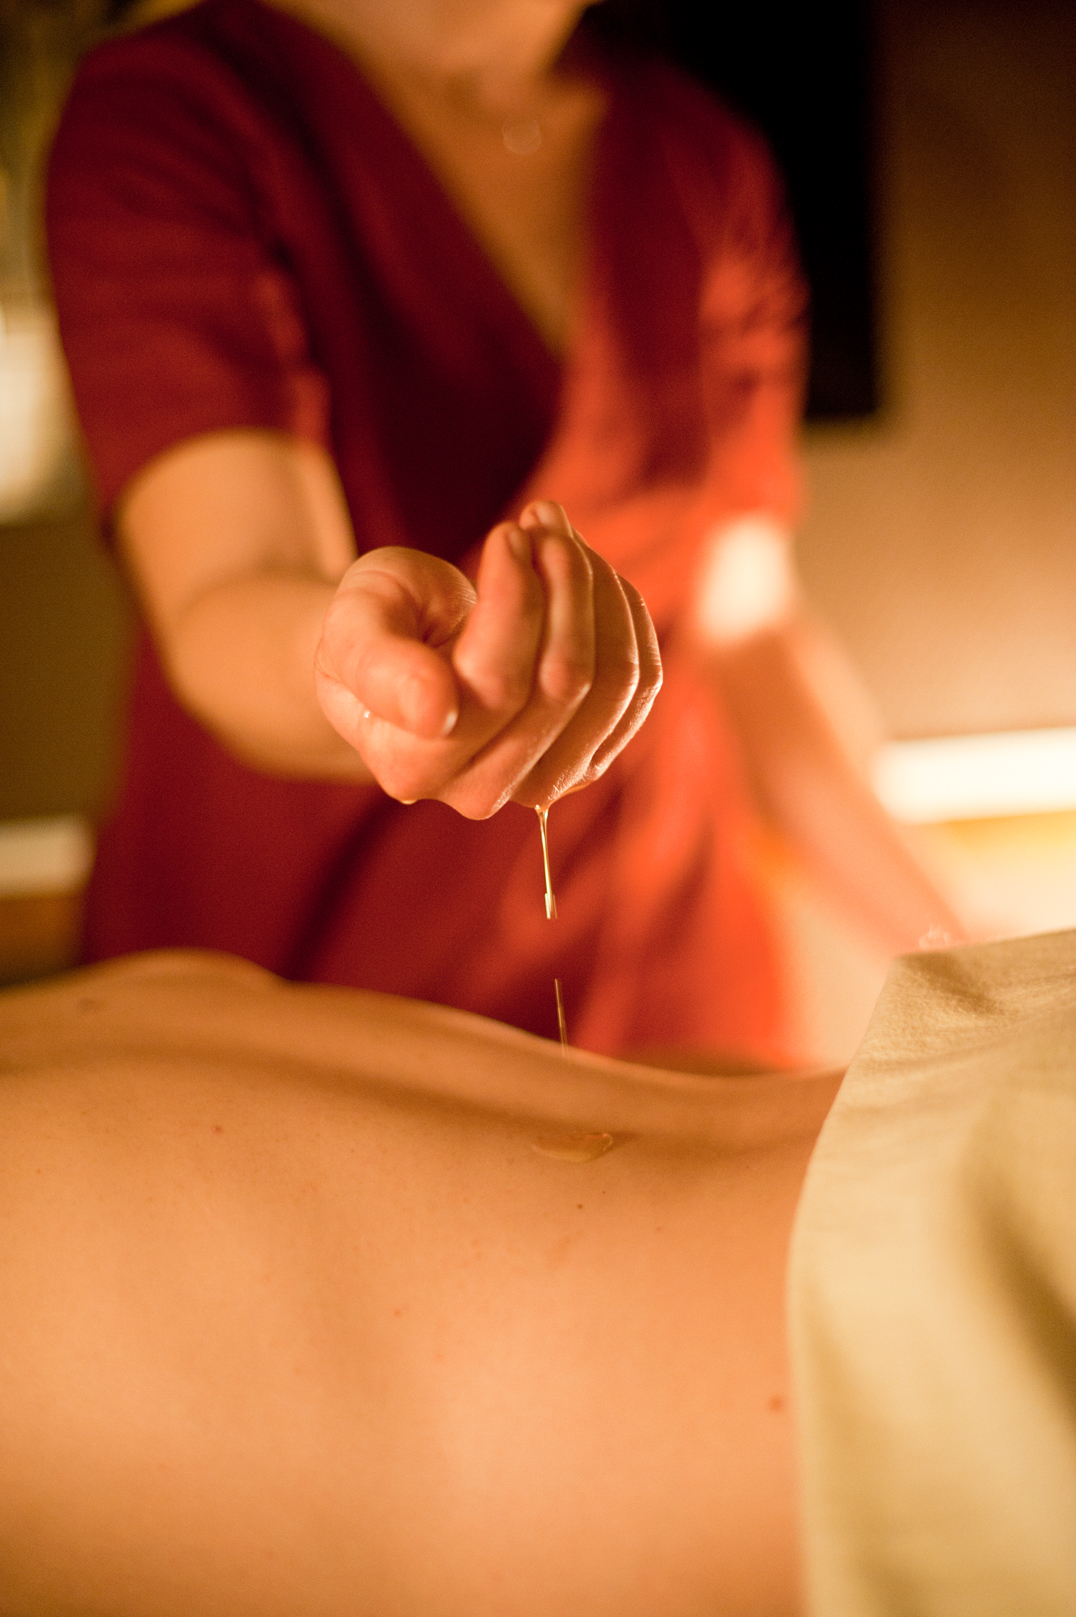 Massages traditionnels selon l'ayurvéda